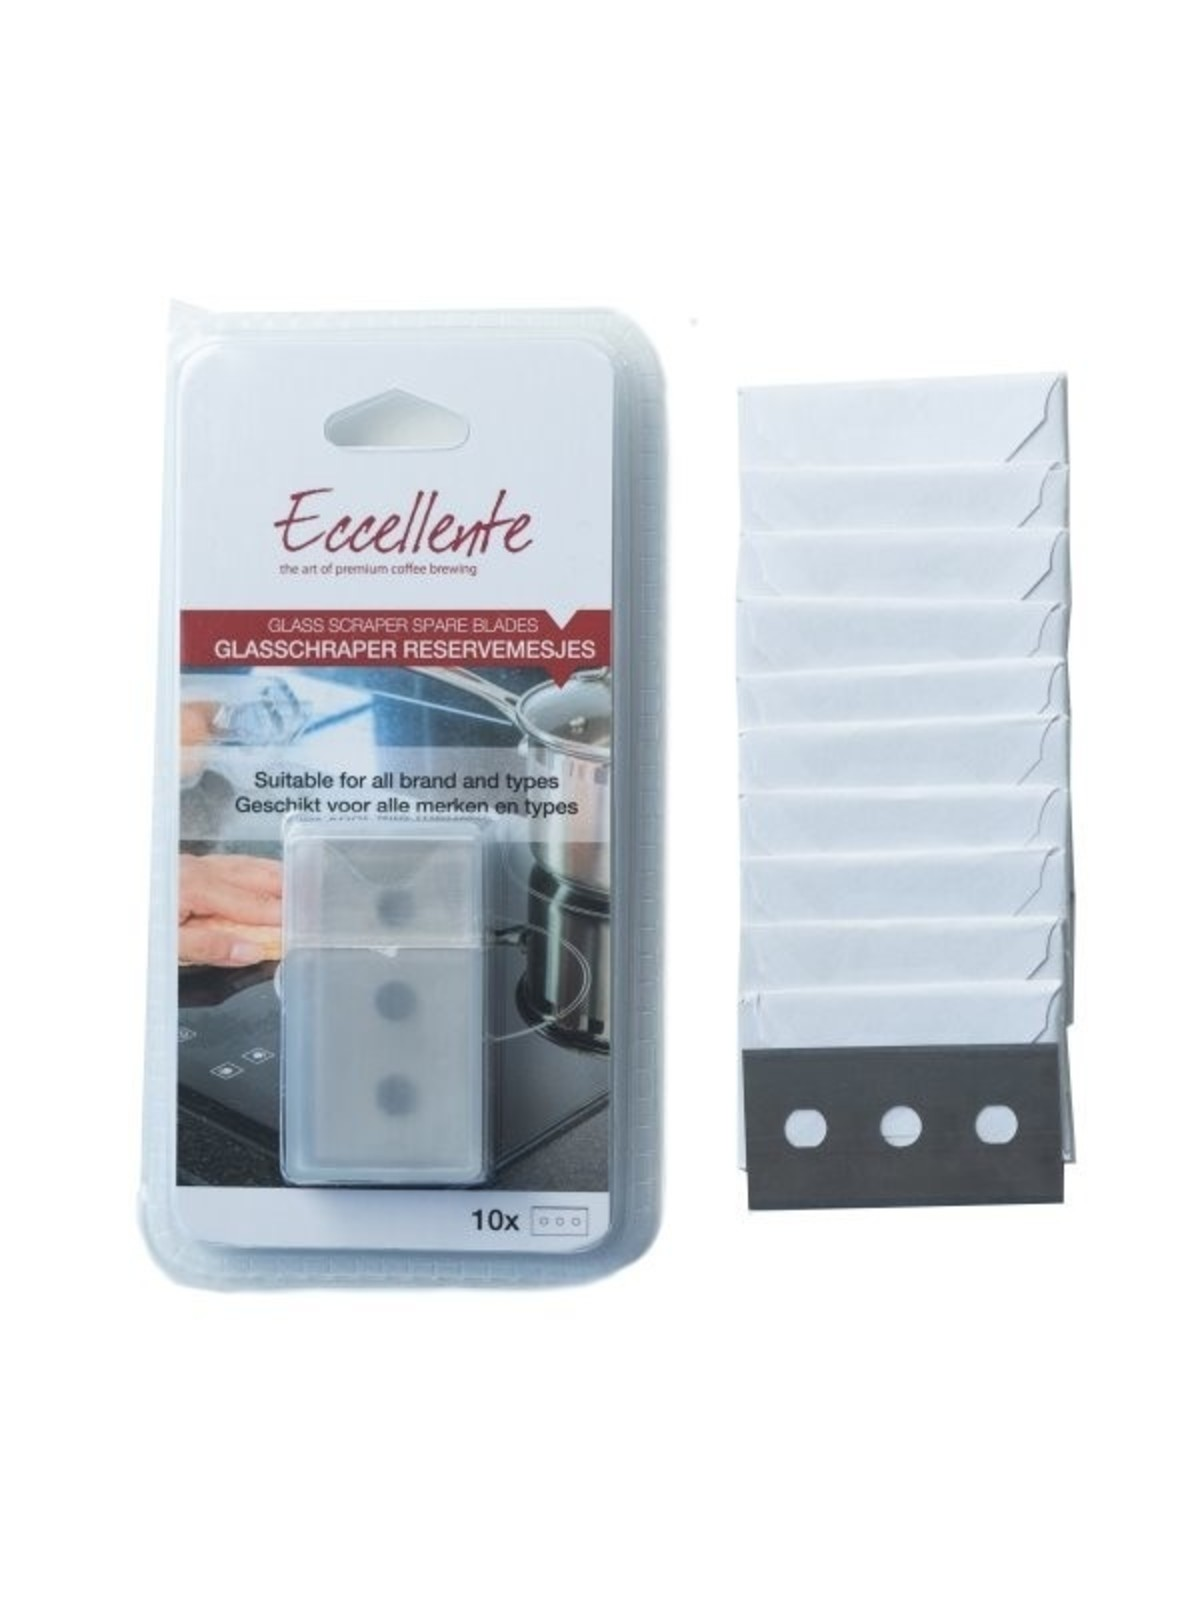 ECCELLENTE Glasschraper Reservemesjes - 10 stuks